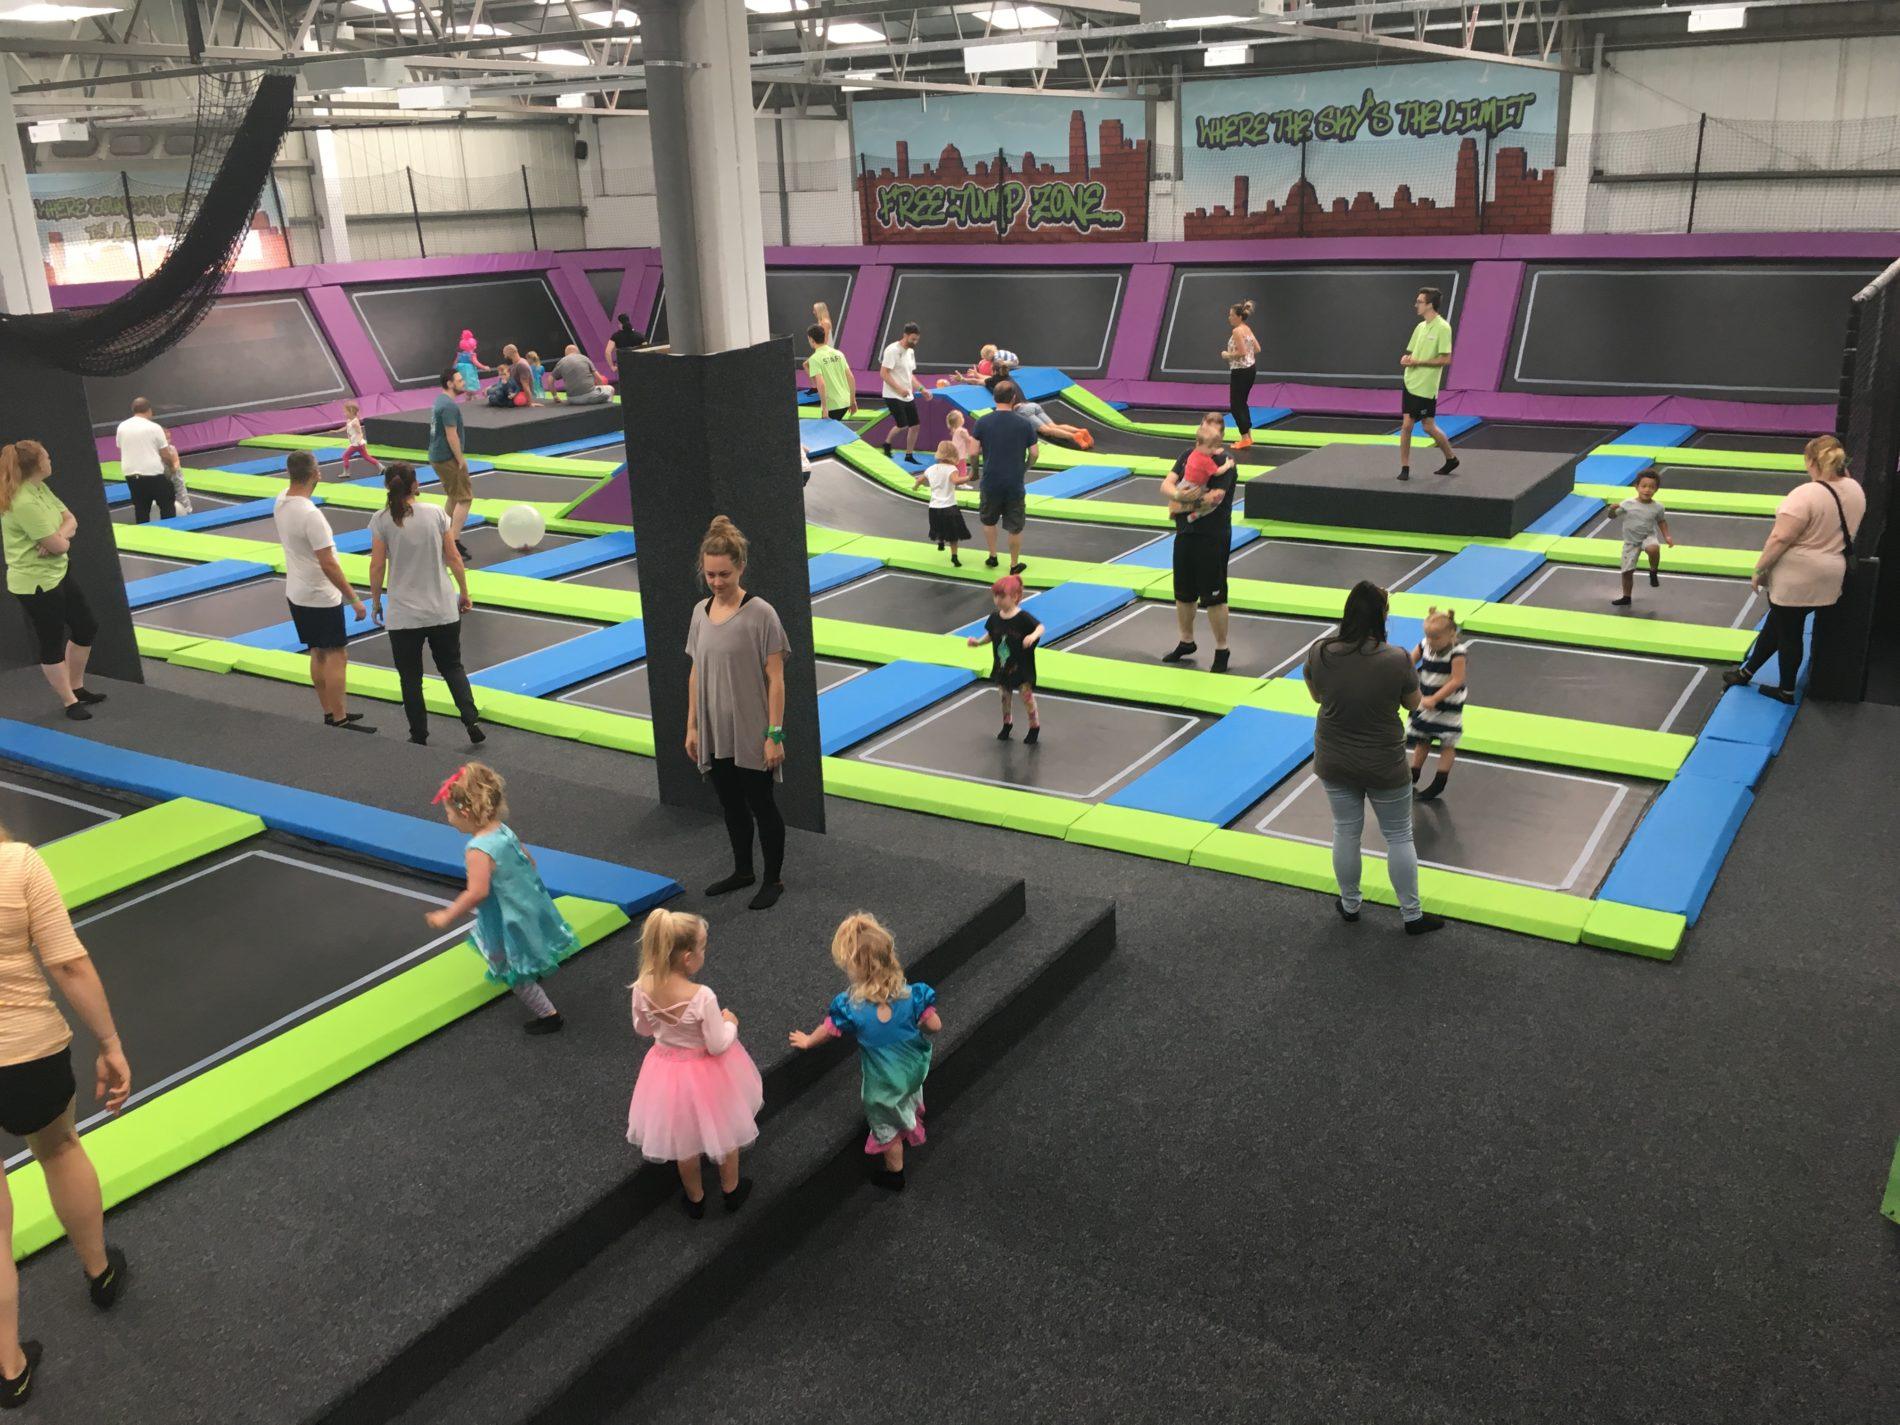 sky high trampoline park a birthday party fit for a princess fitmomtv